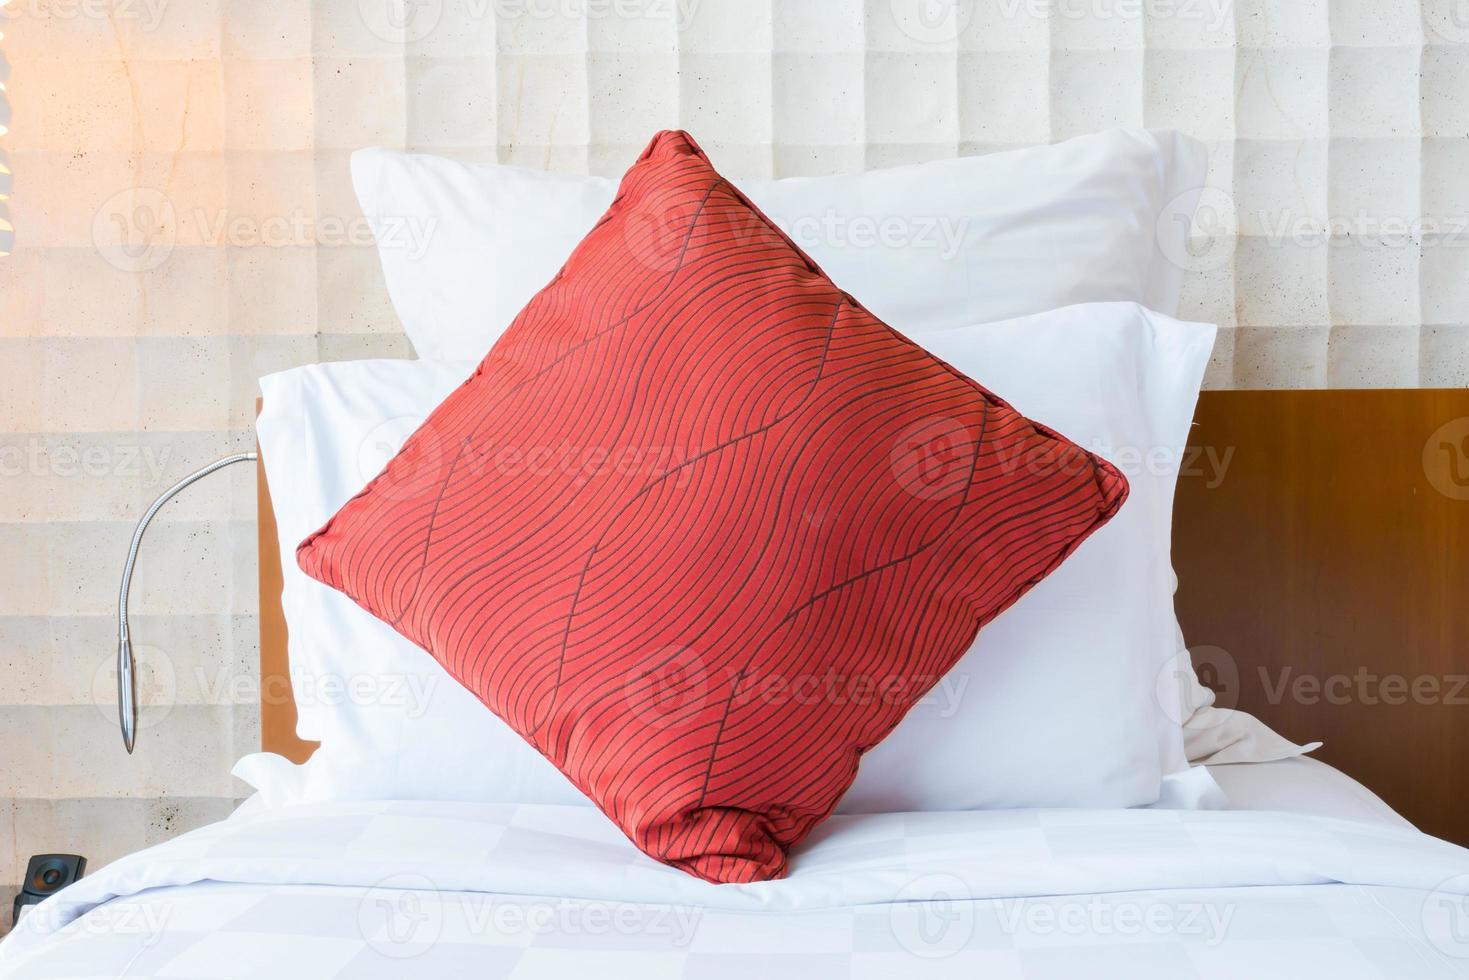 cama con una almohada roja foto